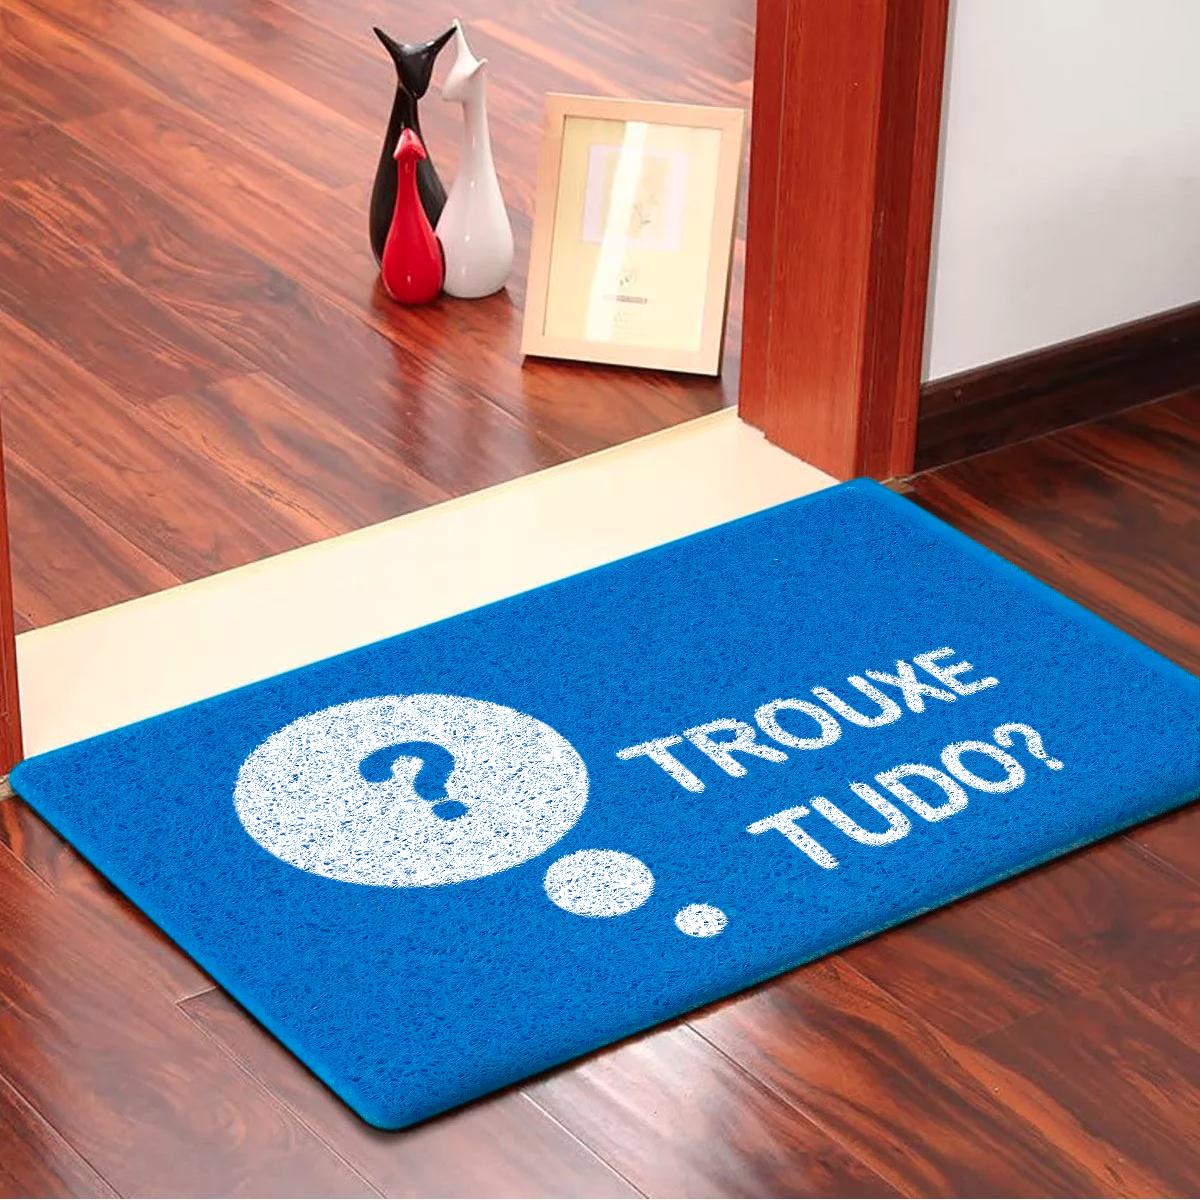 Capacho Trouxe Tudo? Emborrachado Azul - 60 cm x 40 cm - Carpet Black